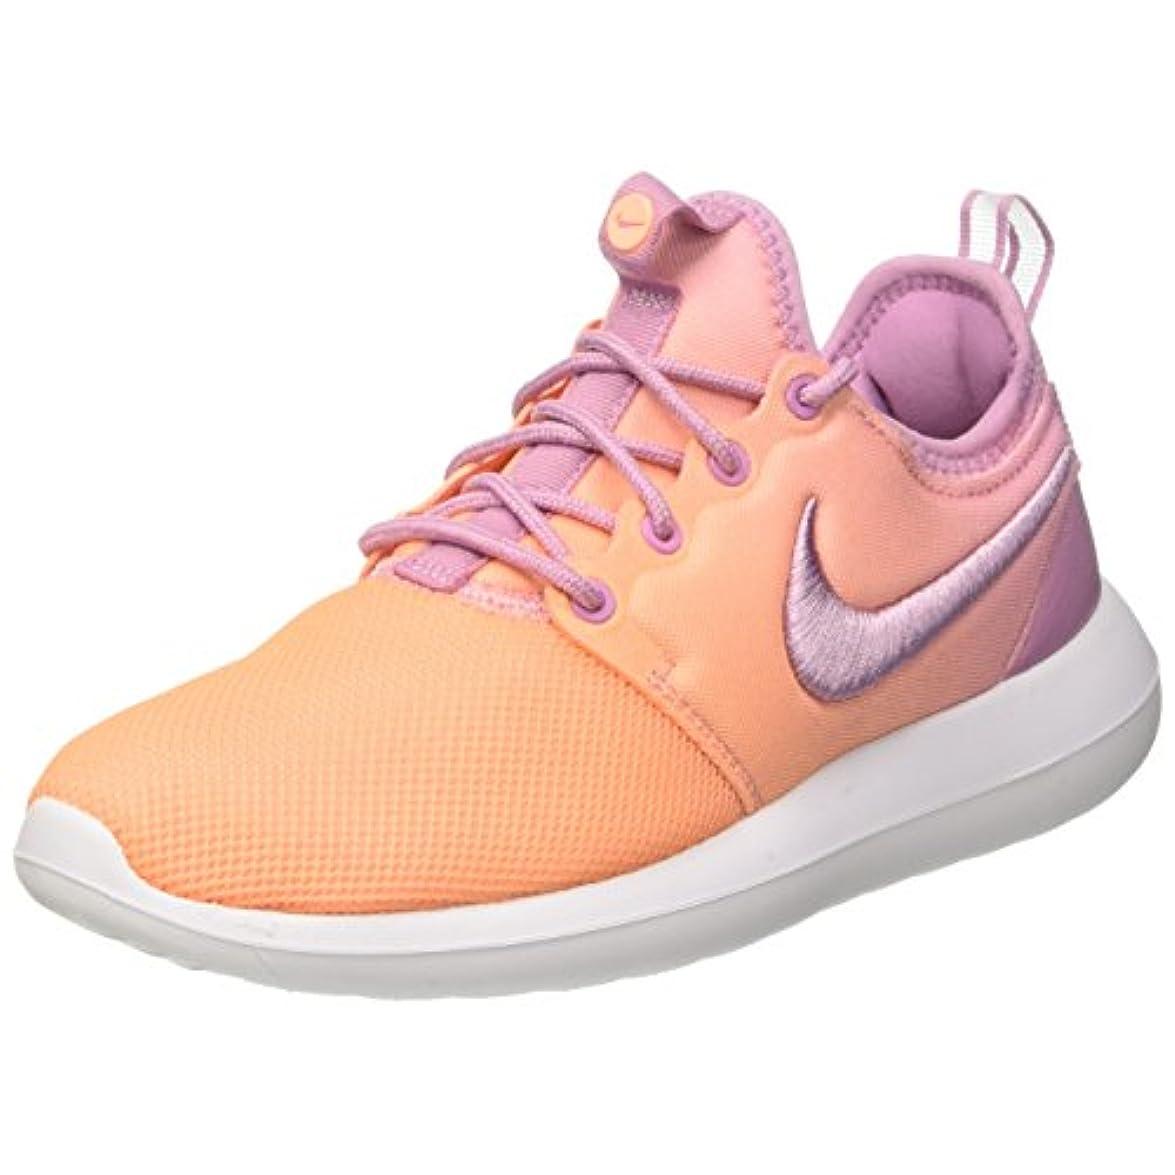 Nike Wmns Roshe Two Br Scarpe Da Ginnastica Donna